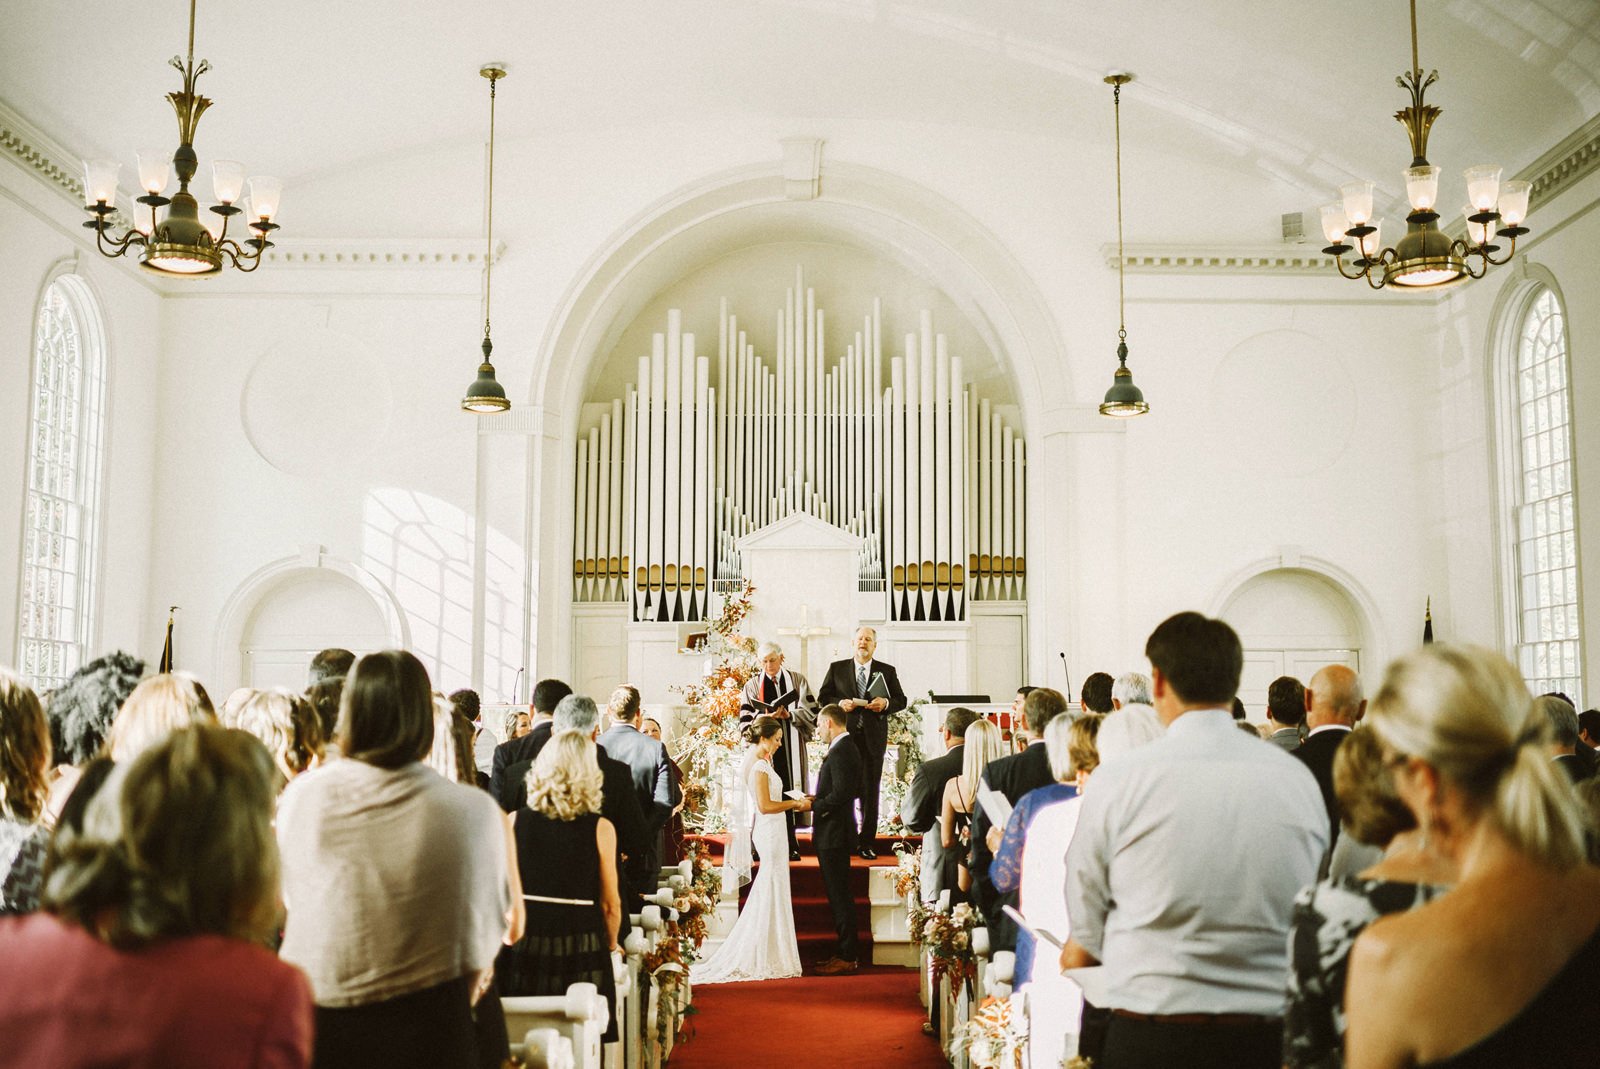 bridgeport-wedding-063 BRIDGEPORT, CONNECTICUT BACKYARD WEDDING